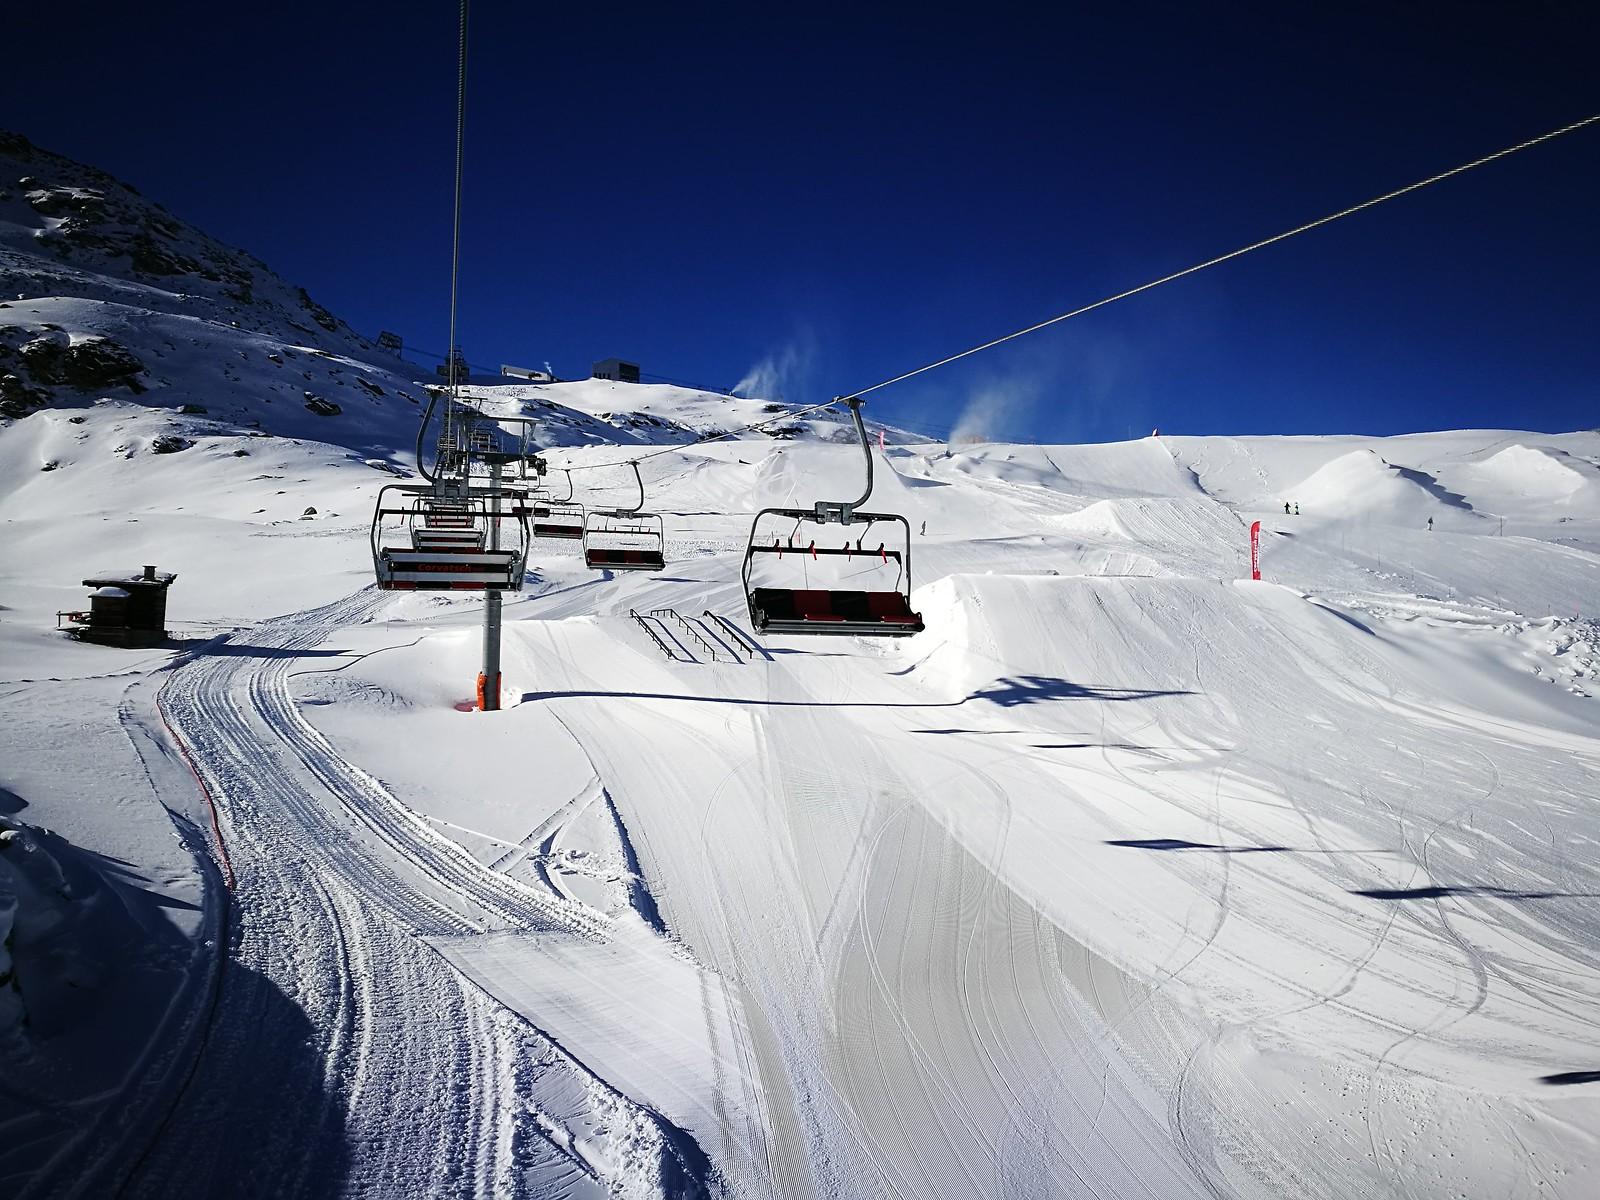 Ski park at Corvatsch